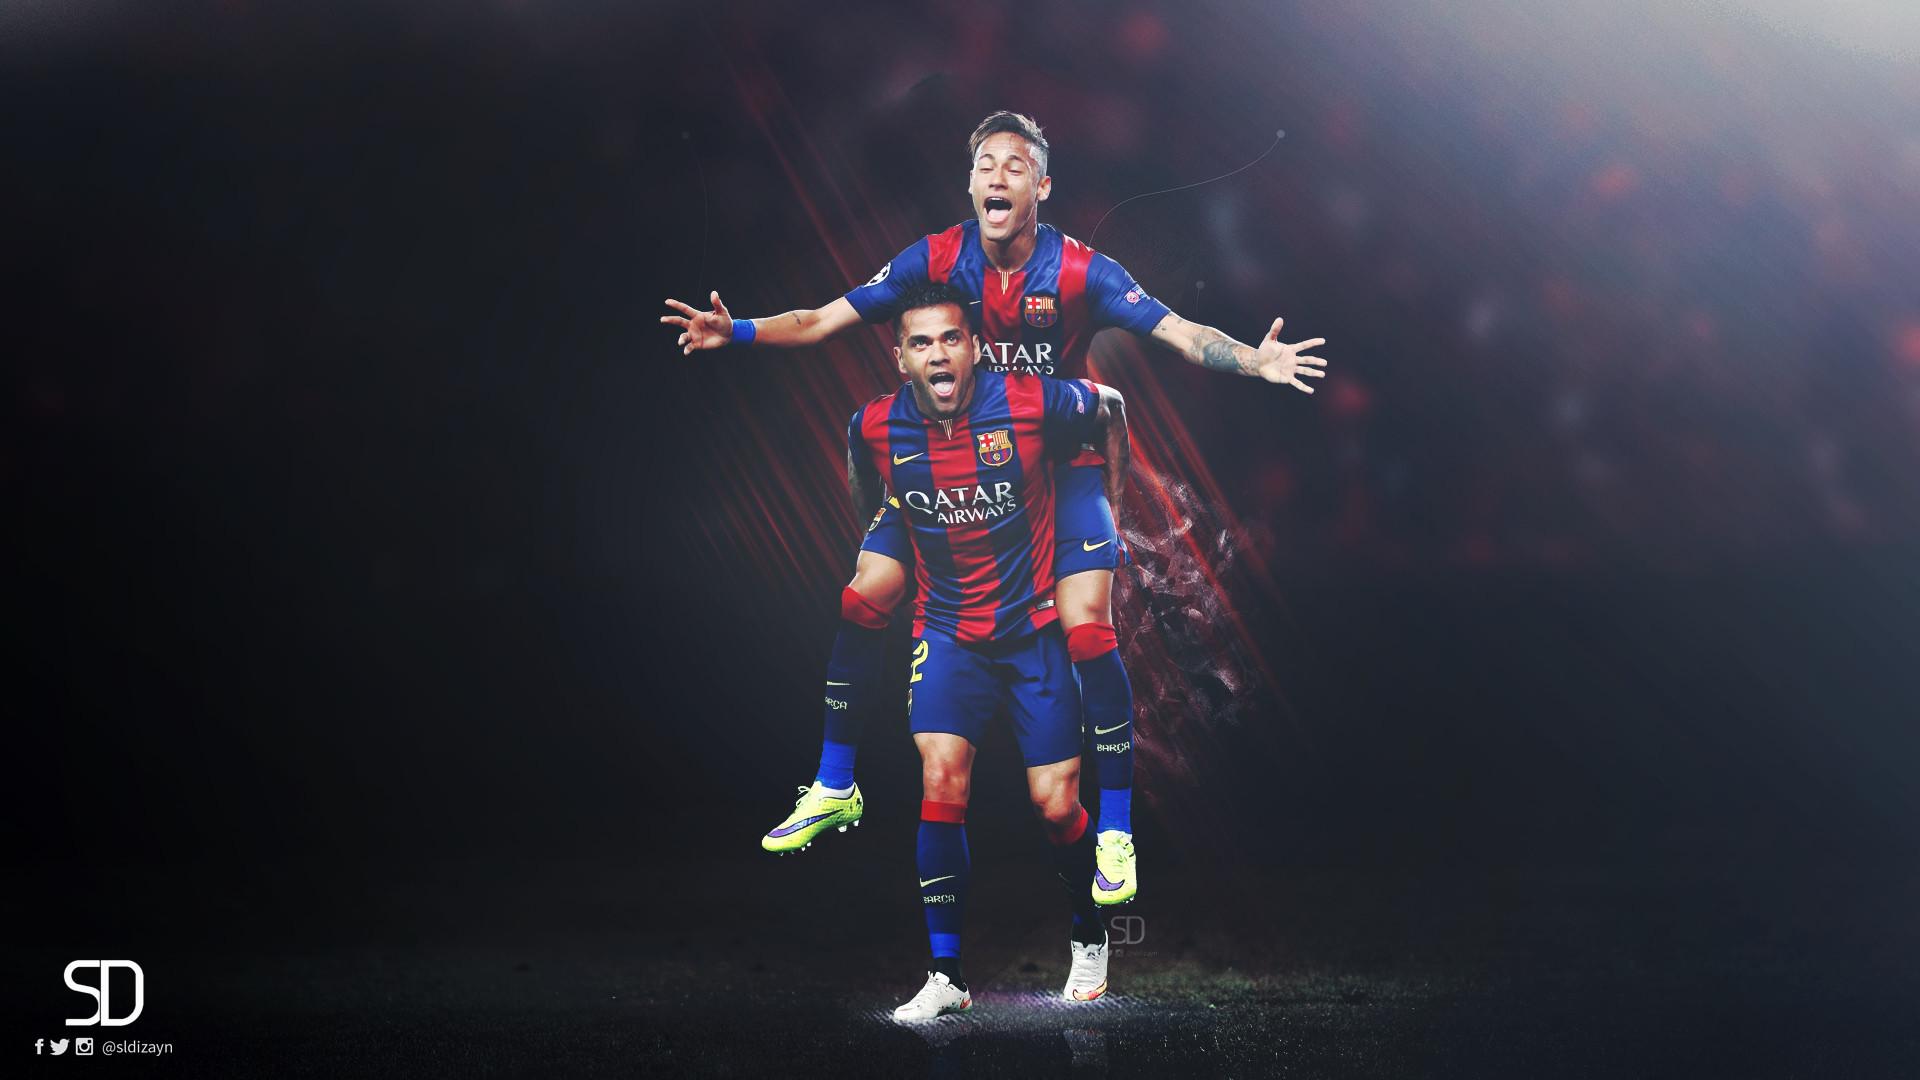 Neymar Jr Nike Wallpaper | Football Wallpapers HD | Pinterest | Nike  wallpaper, Neymar jr and Football wallpaper